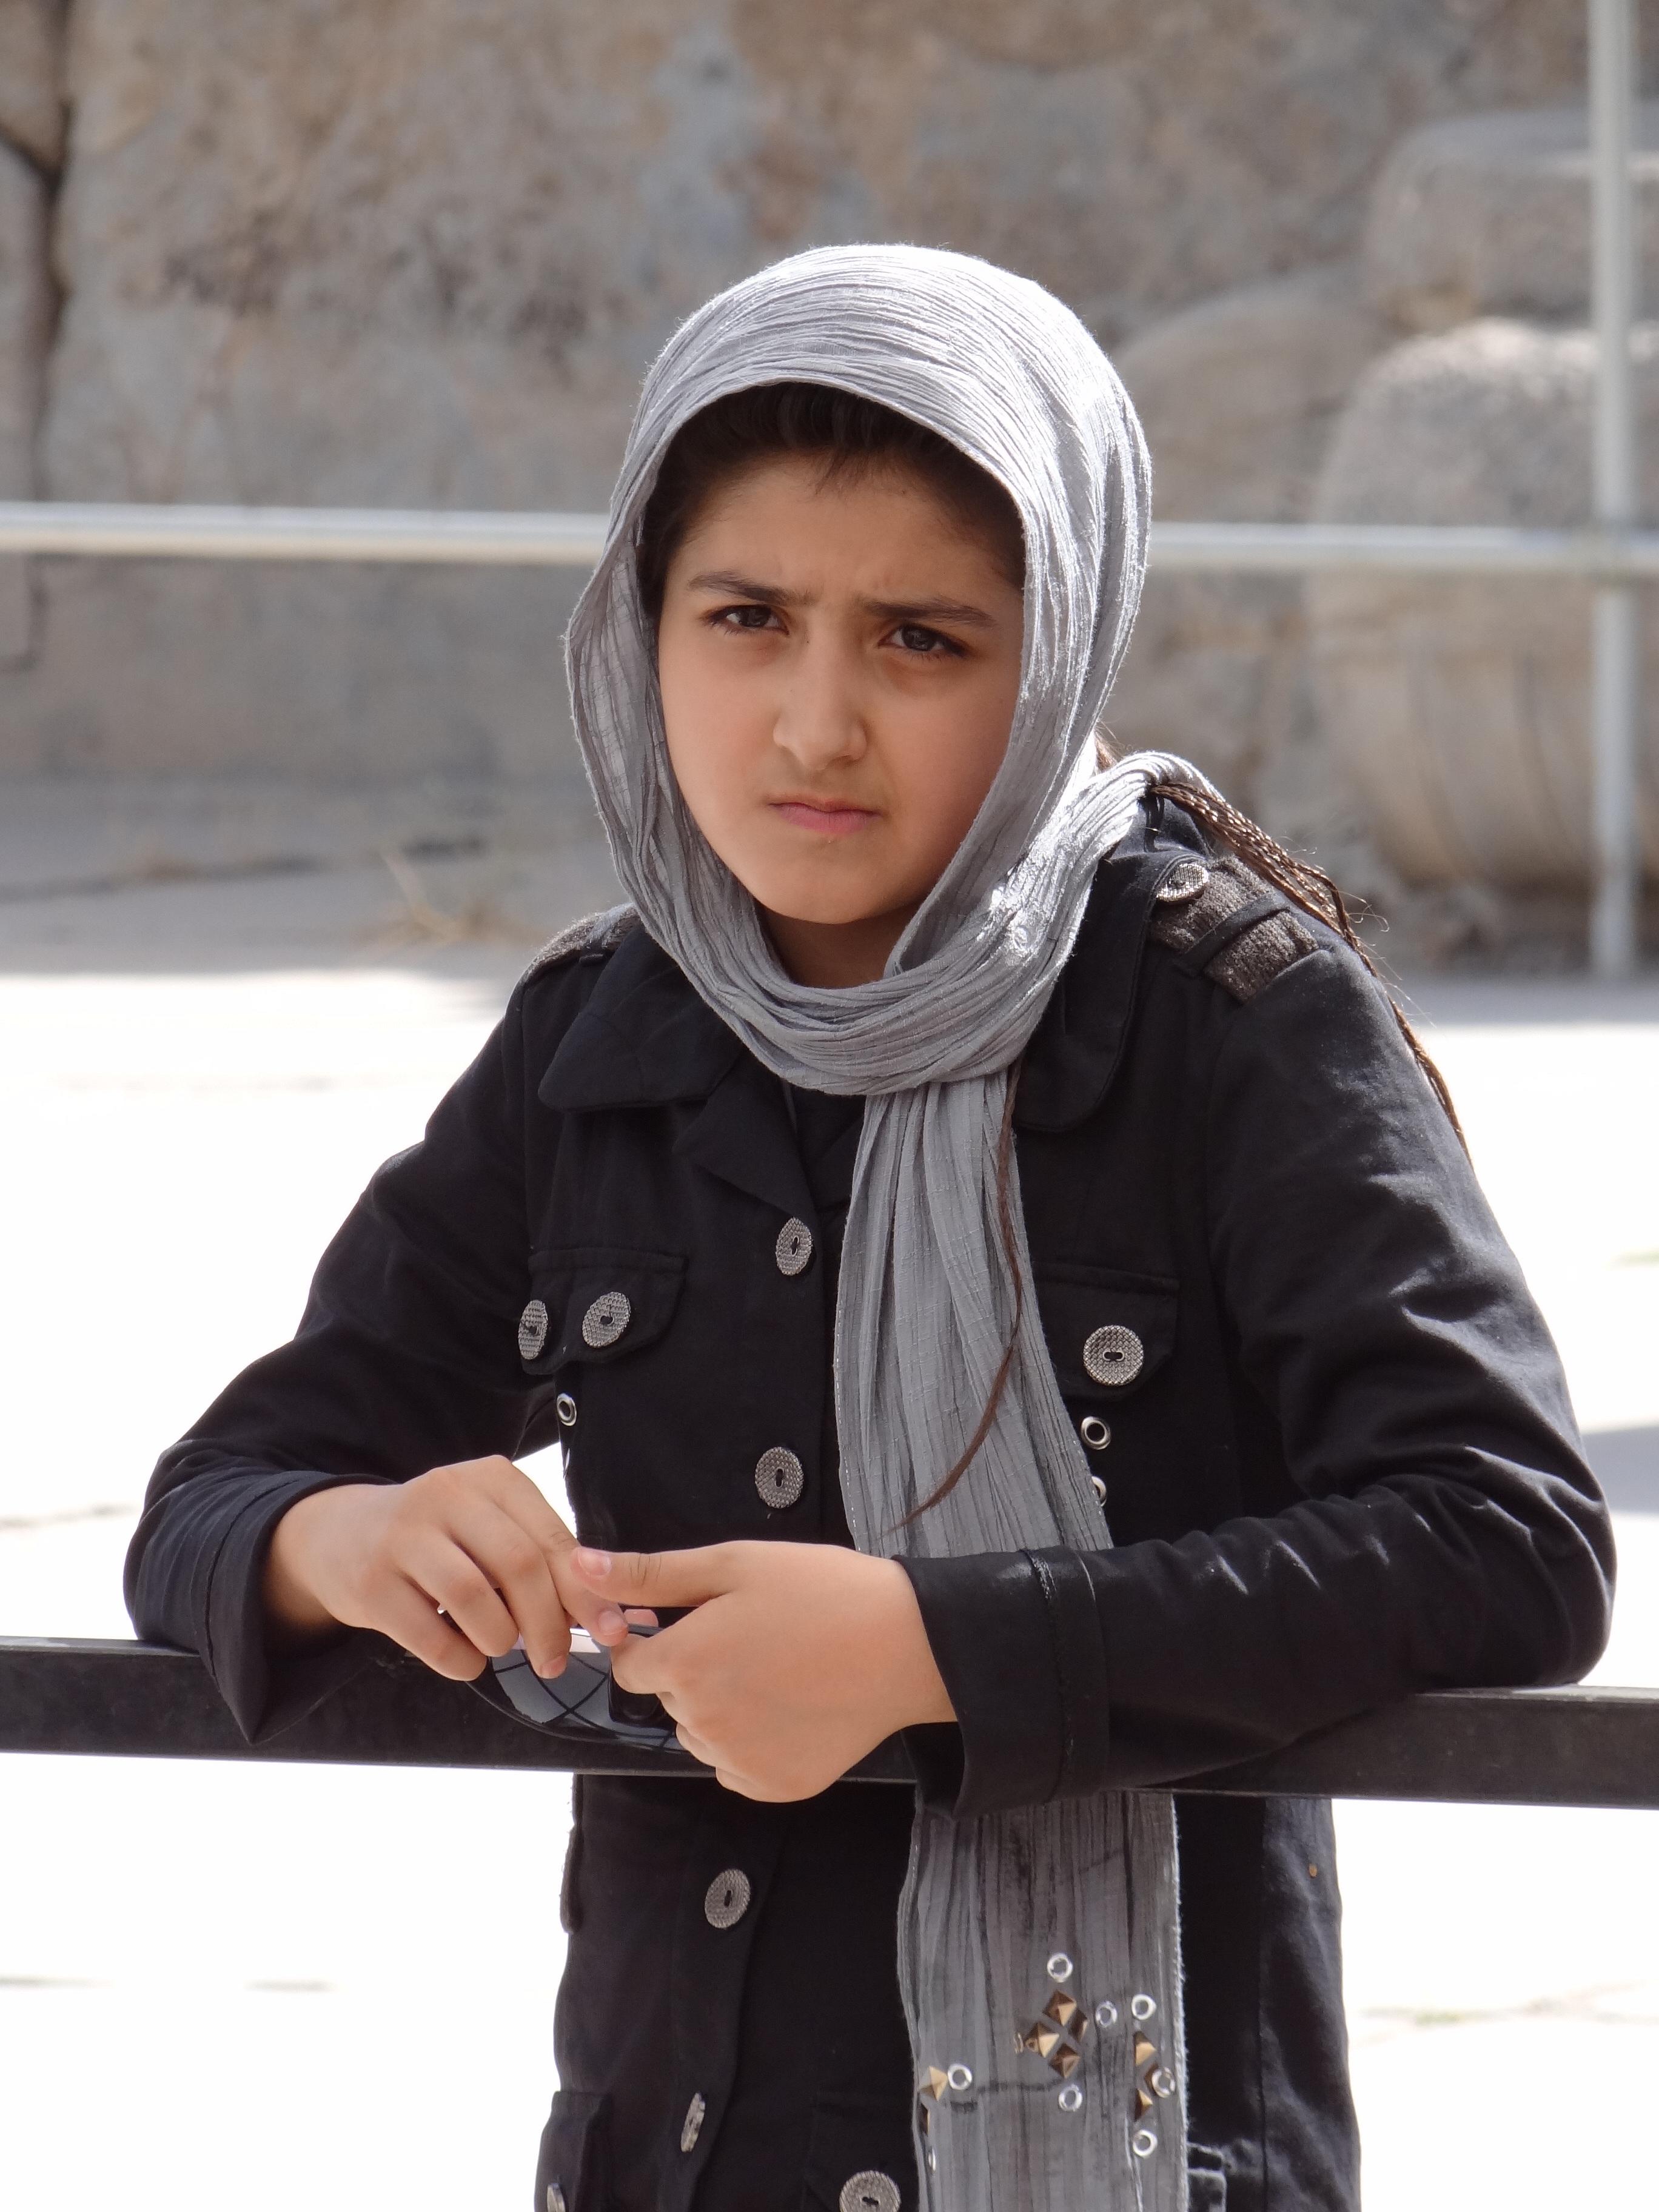 tehran girls